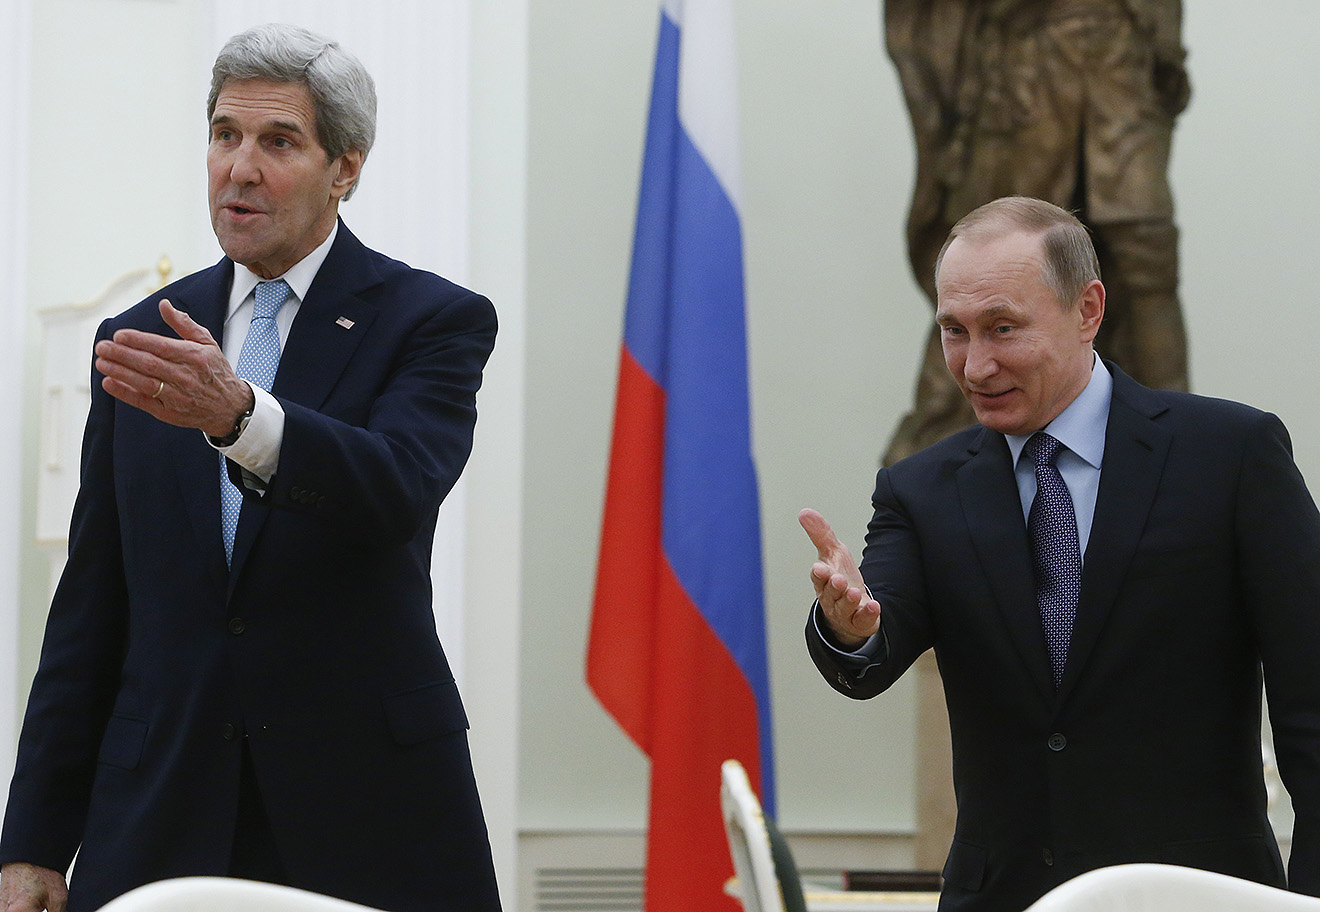 Джон Керри и Владимир Путин, 15 декабря 2015 года.